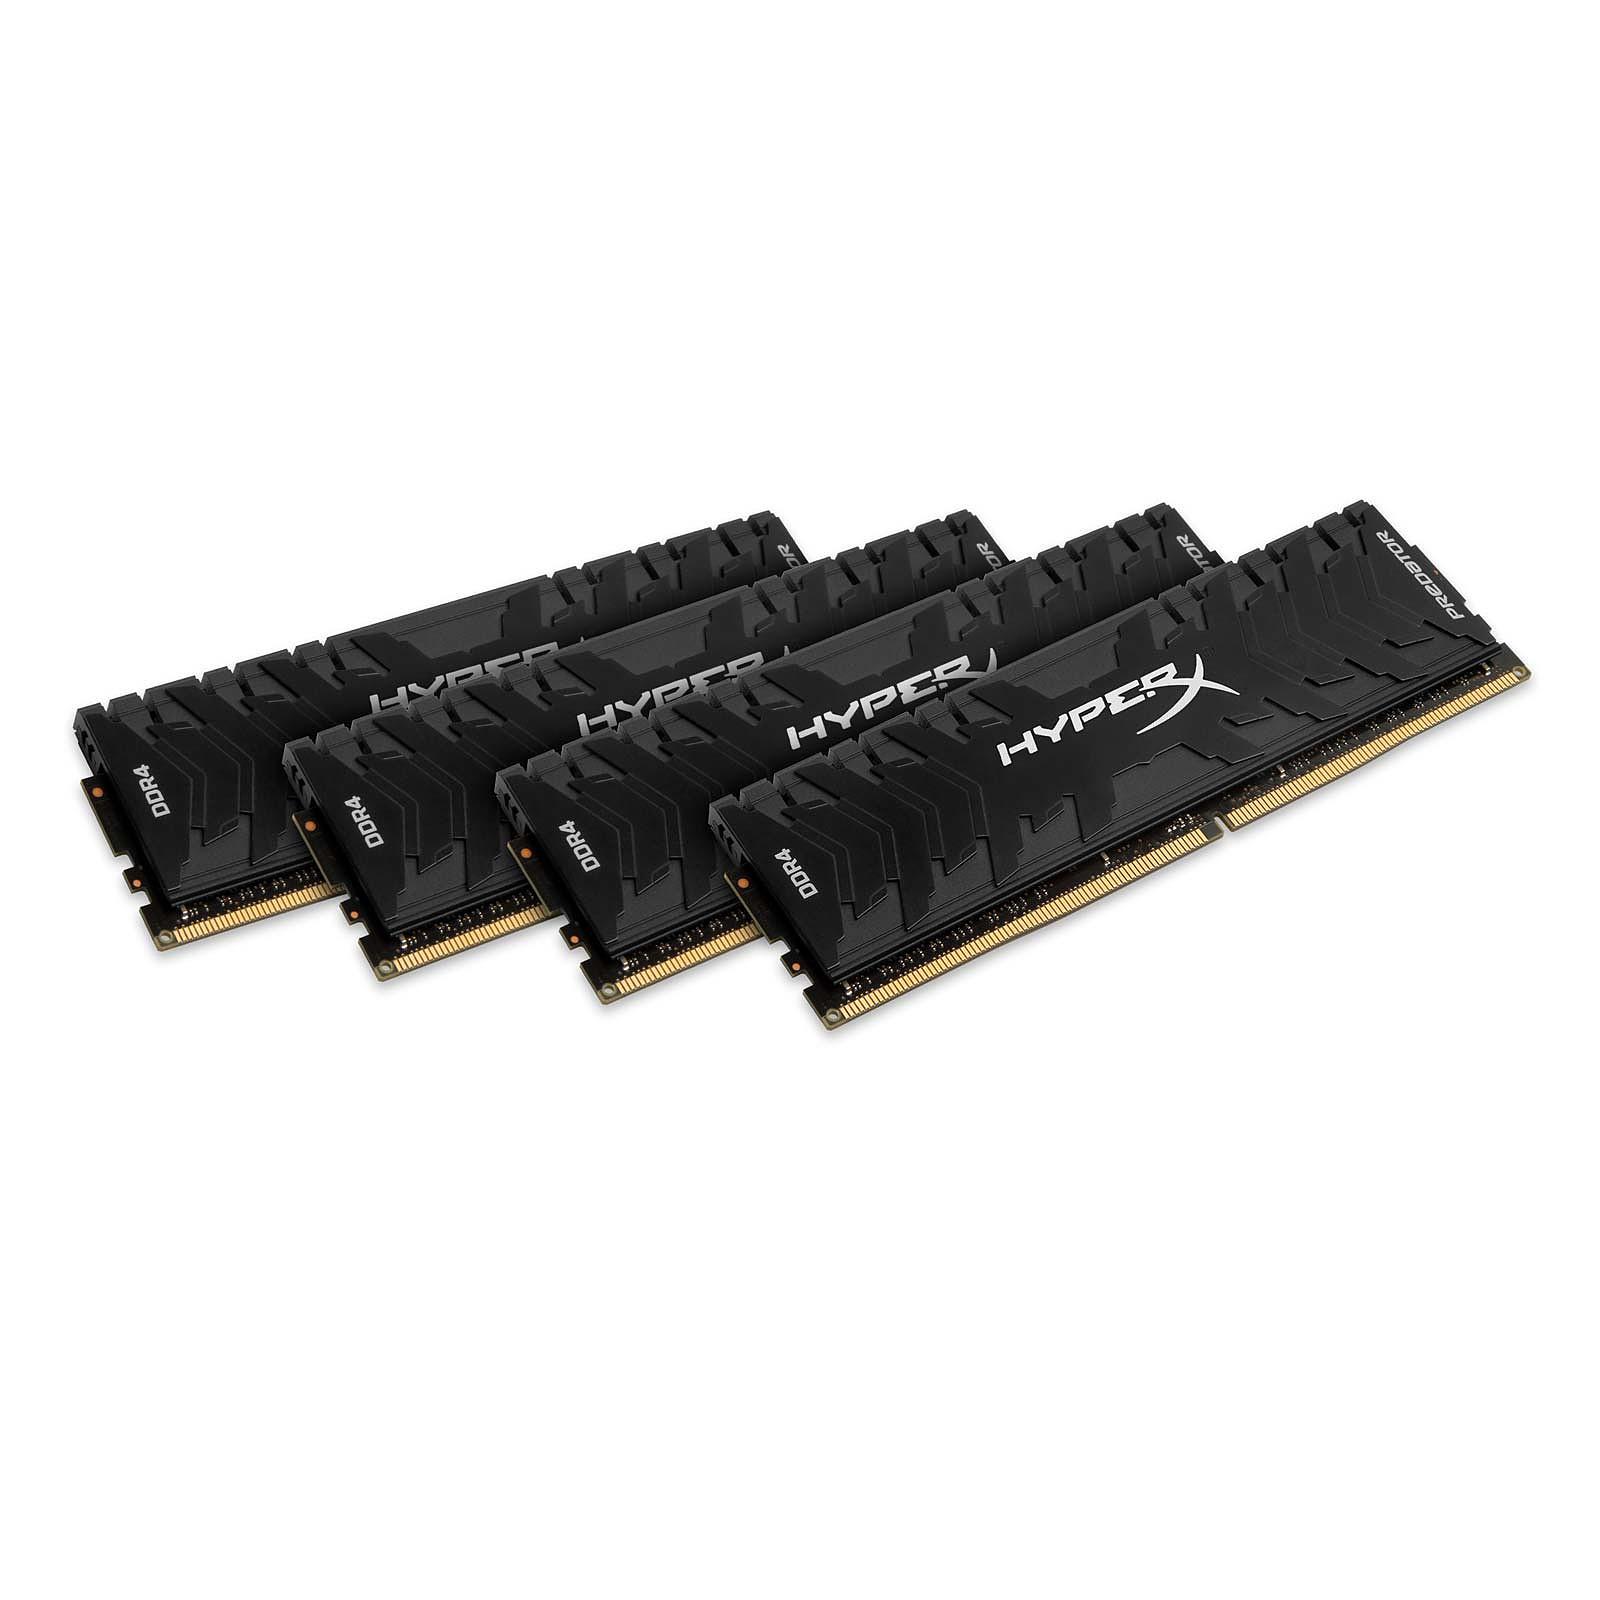 HyperX Predator Noir 64 Go (4x 16 Go) DDR4 3200 MHz CL16